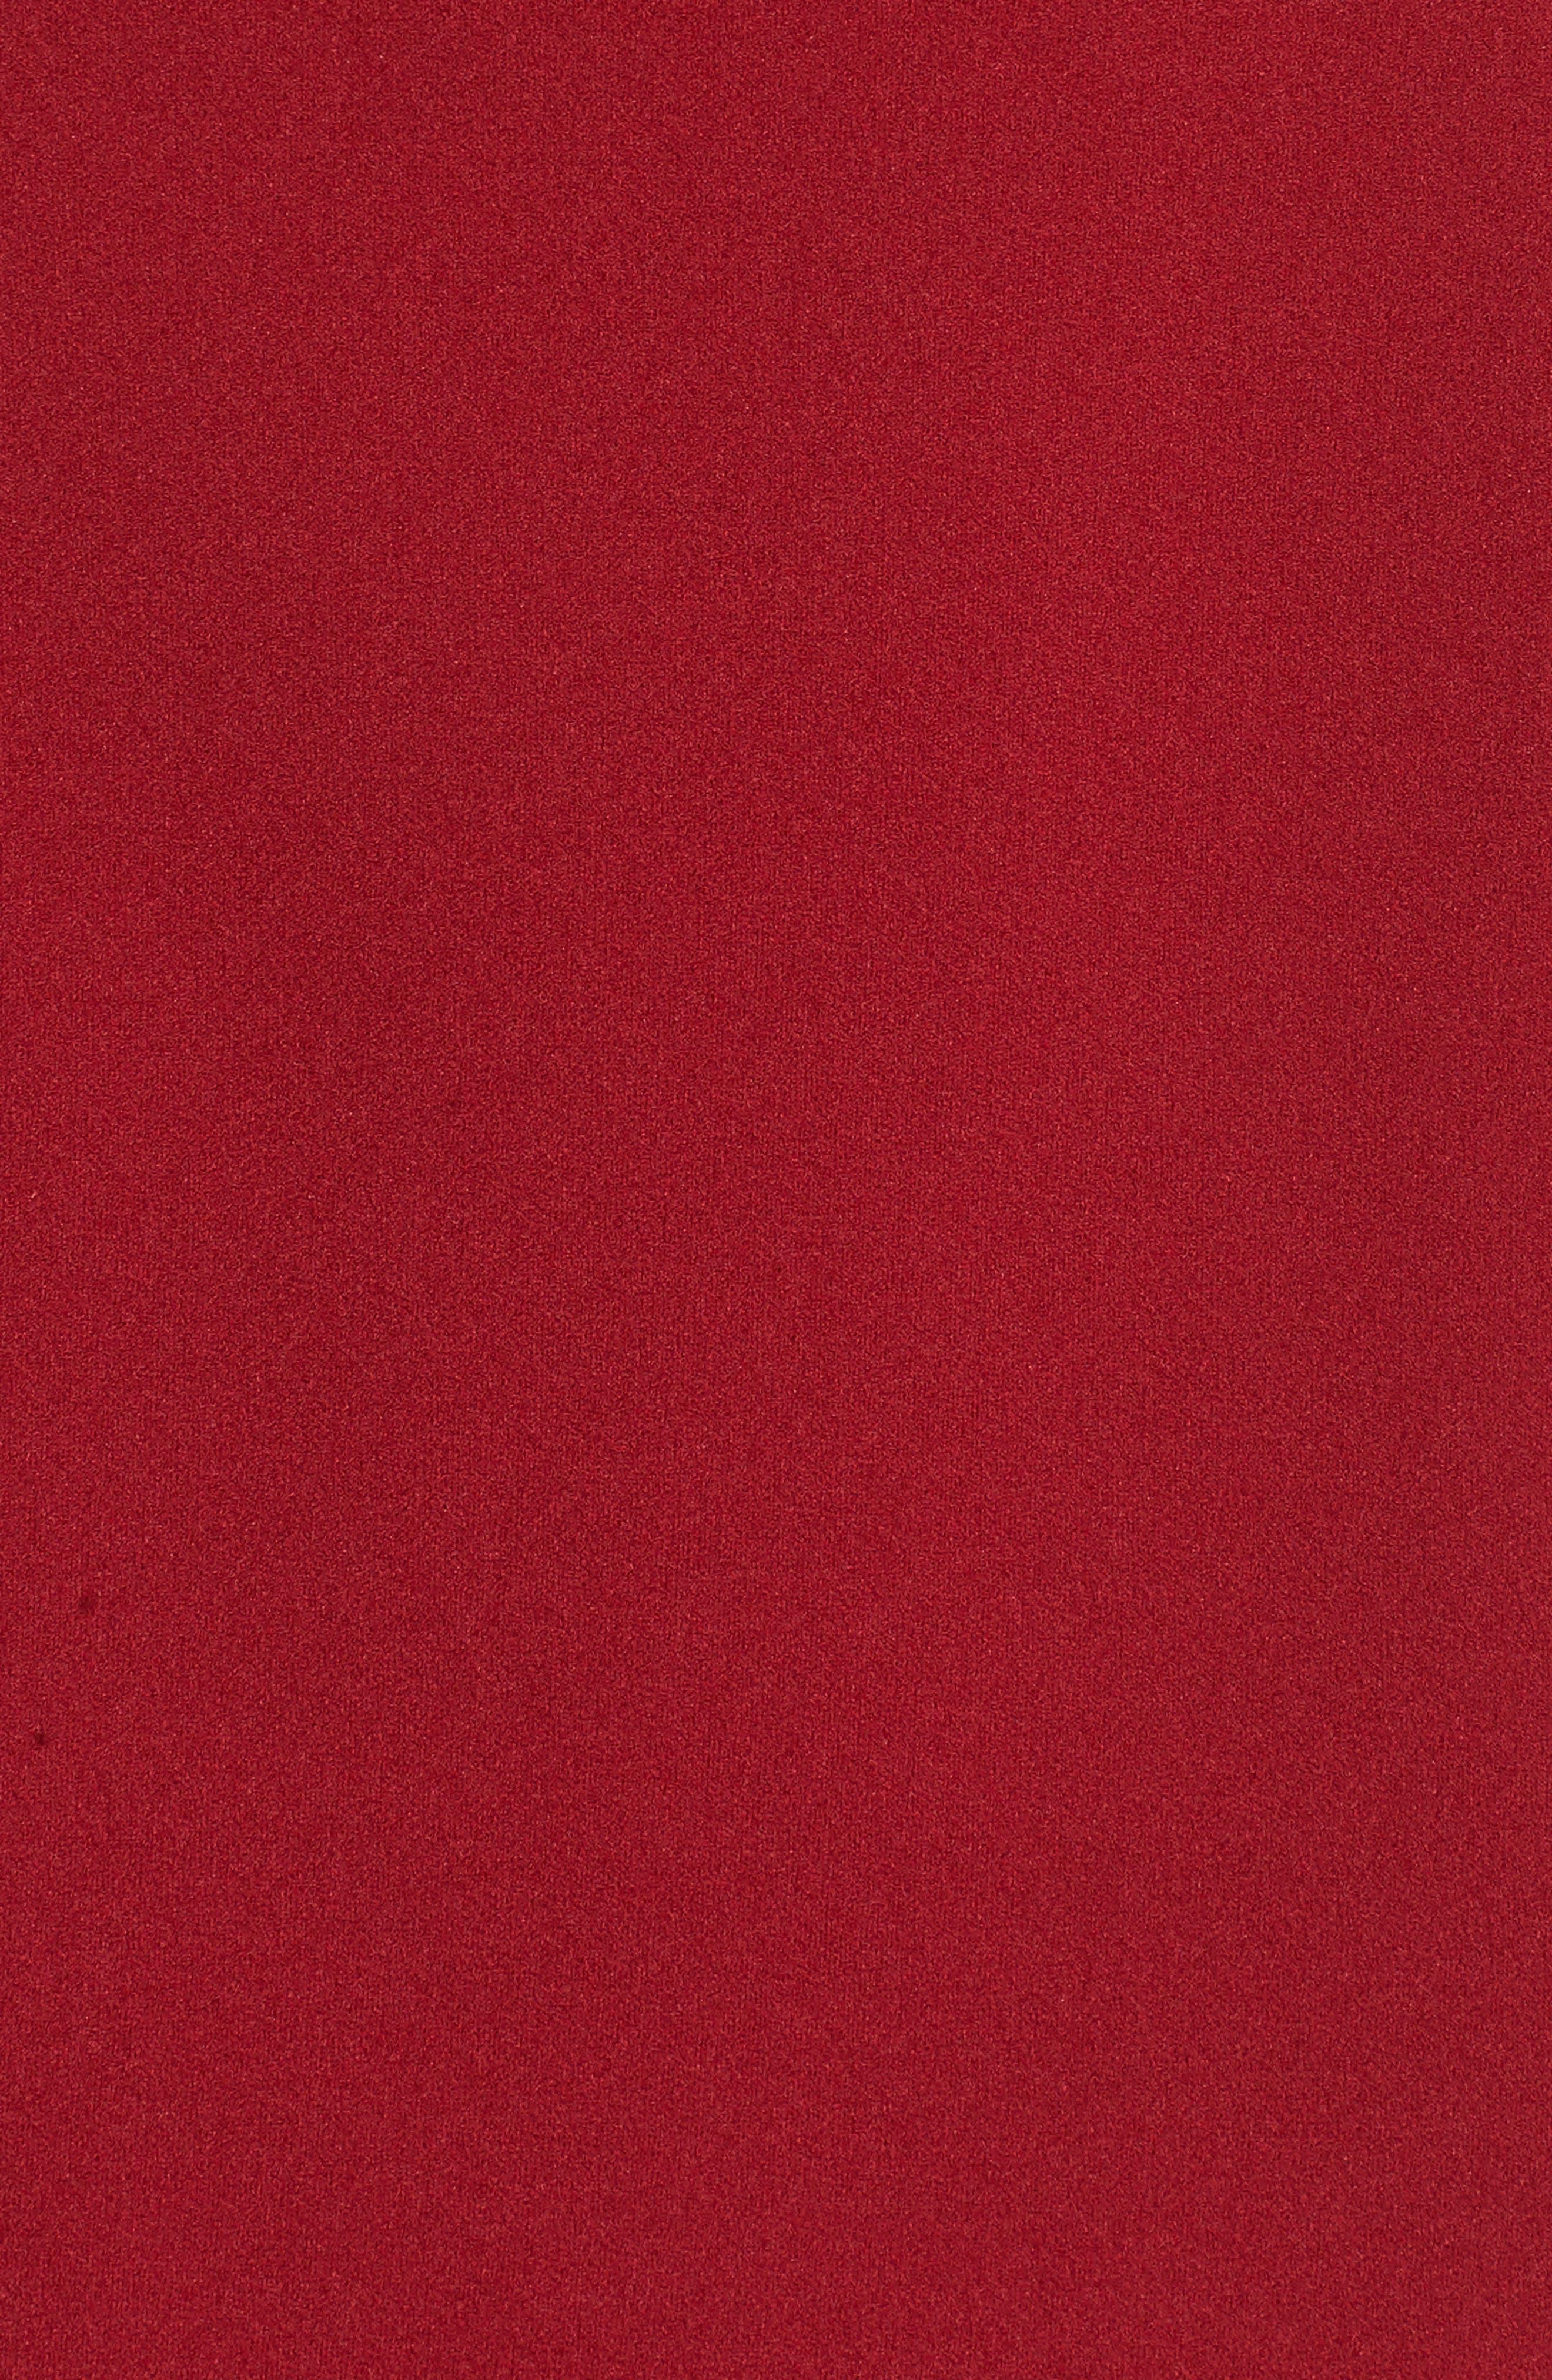 Strappy Illusion Yoke Sheath Dress,                             Alternate thumbnail 5, color,                             Garnet